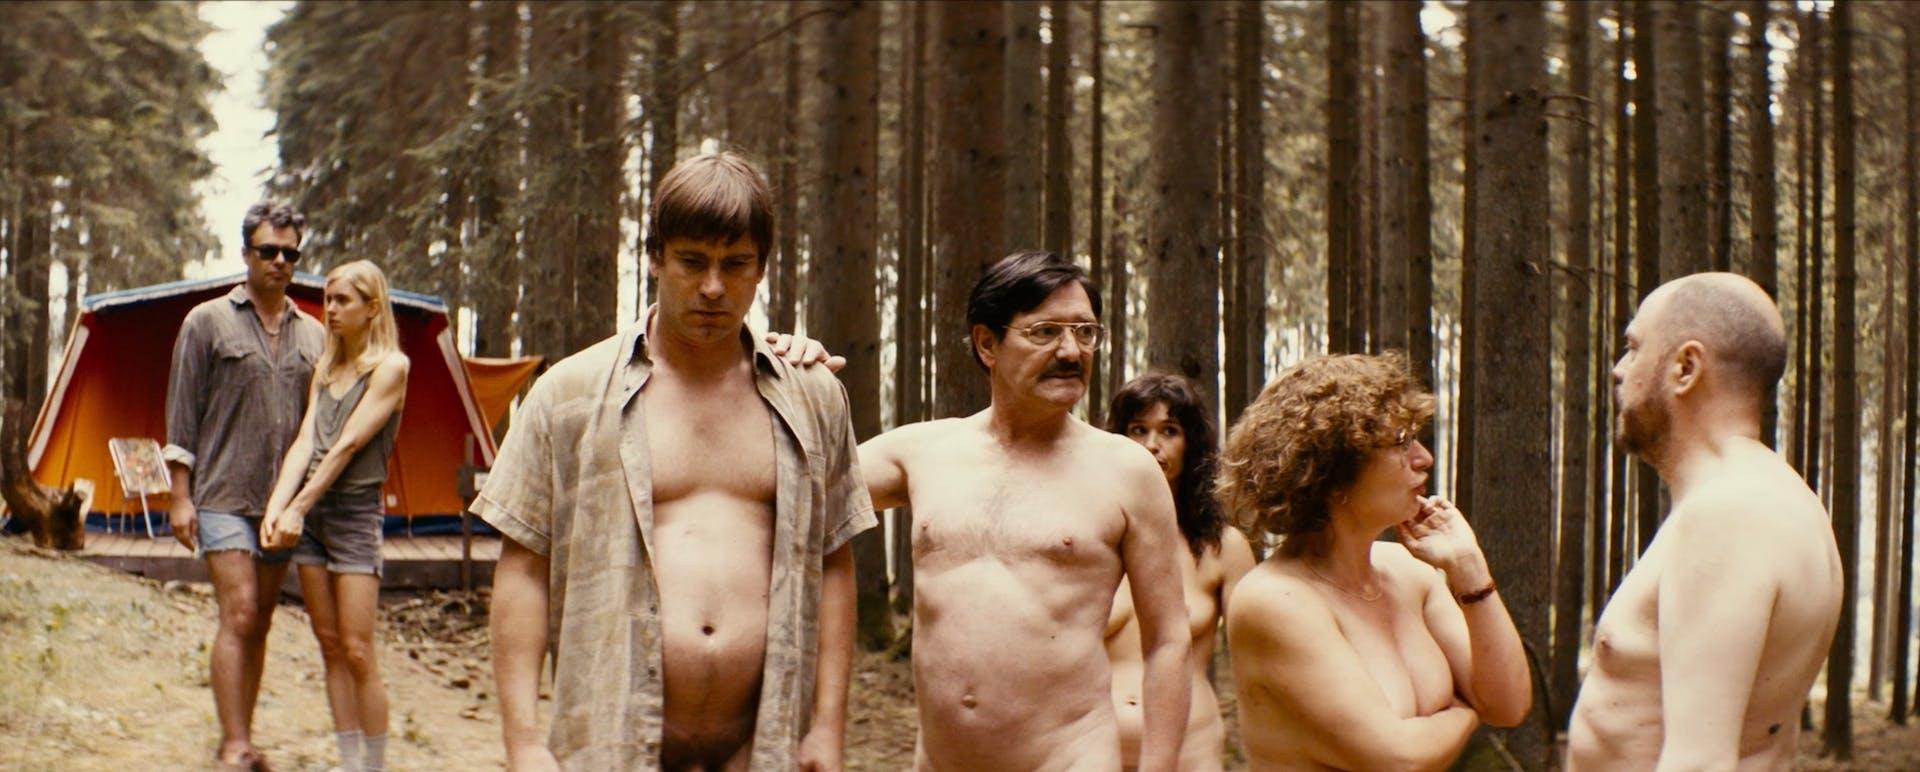 Patrick - Nude screening